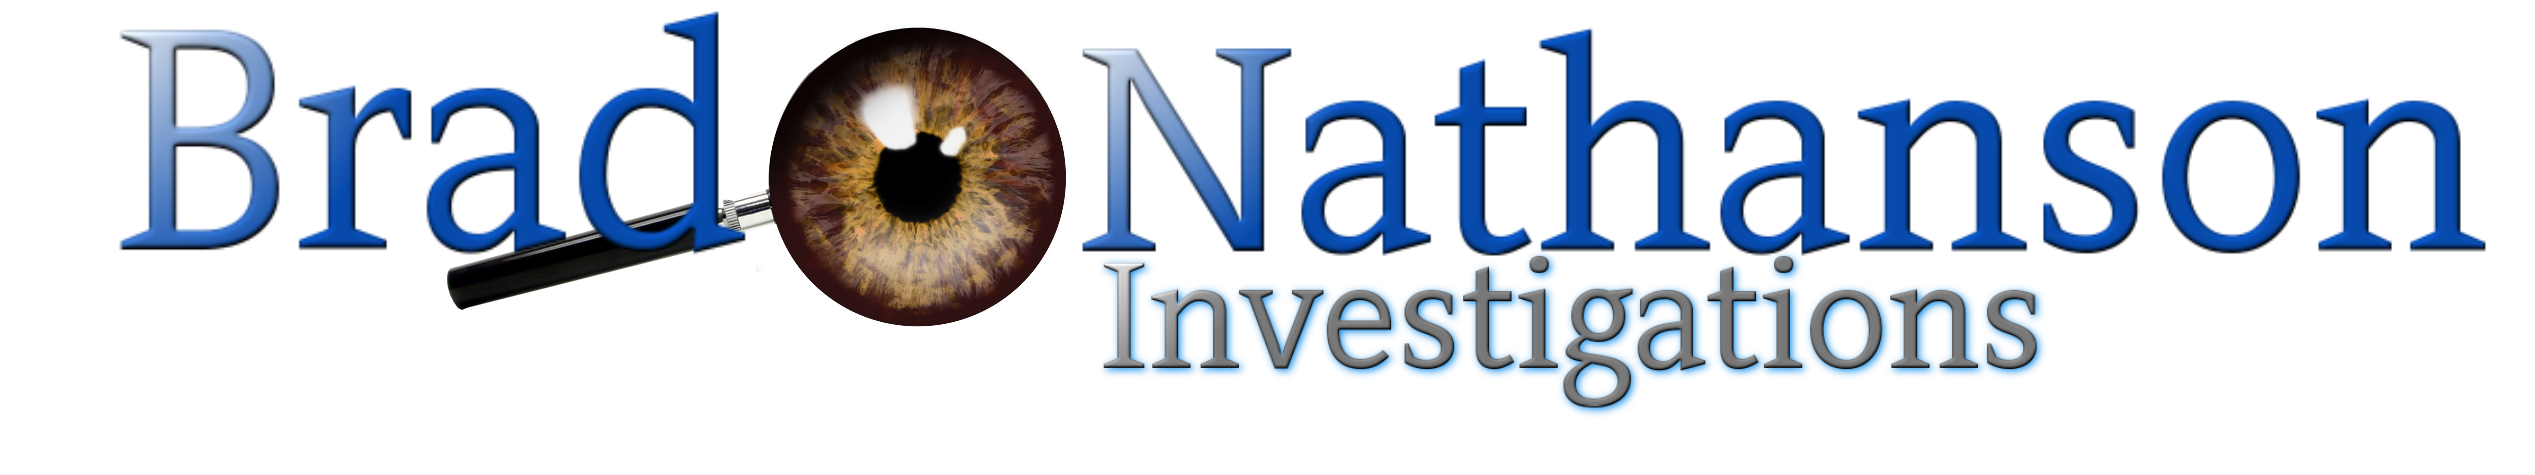 Brad Nathanson Investigations